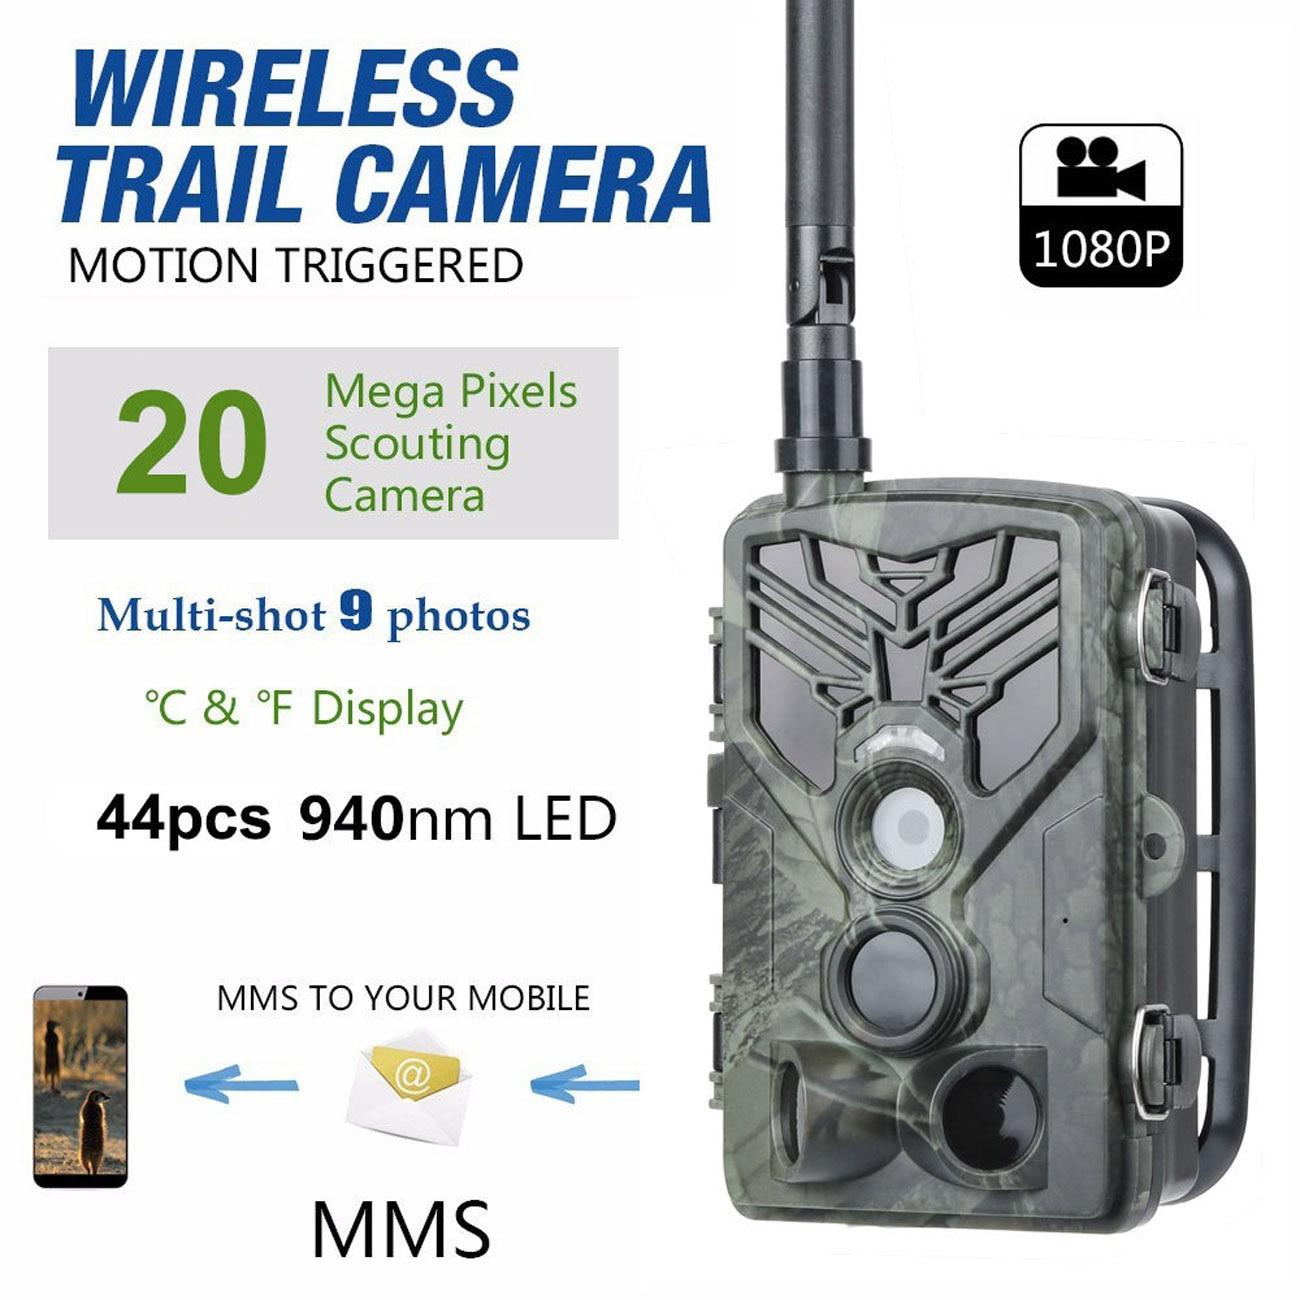 HC-810M 2G الصيد تريل كاميرا 16MP 1080P MMS/SMTP/SMS الحياة البرية كاميرا 0.3sTrigger الصورة الفخاخ للرؤية الليلية هنتر الحياة البرية